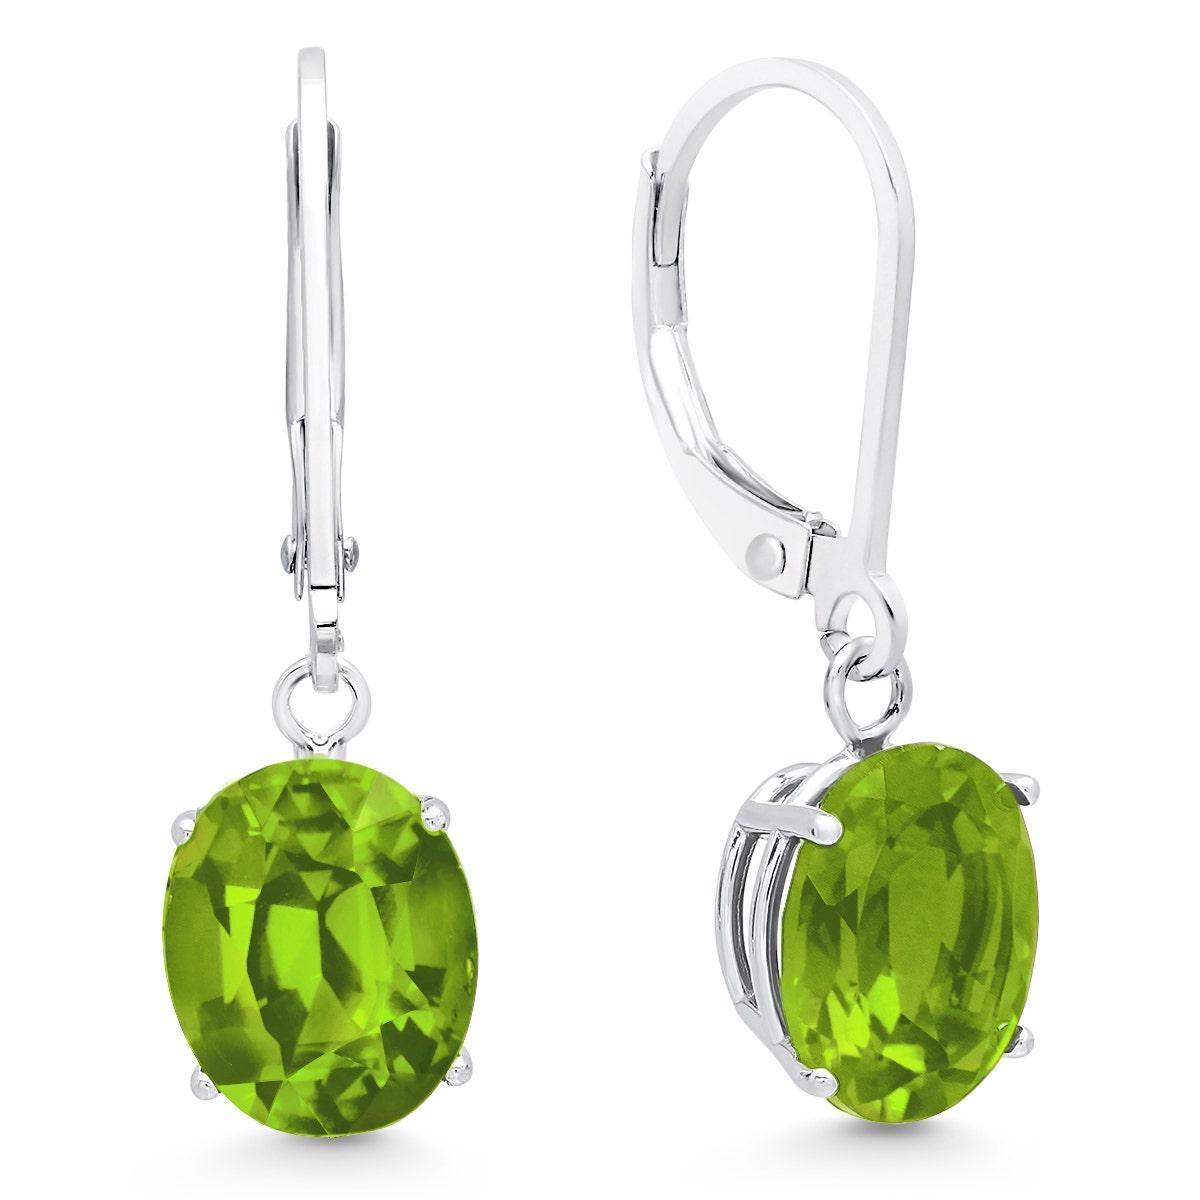 14K White Gold Created Diamond Halo Round Birthstone Dangle Leverback Earrings